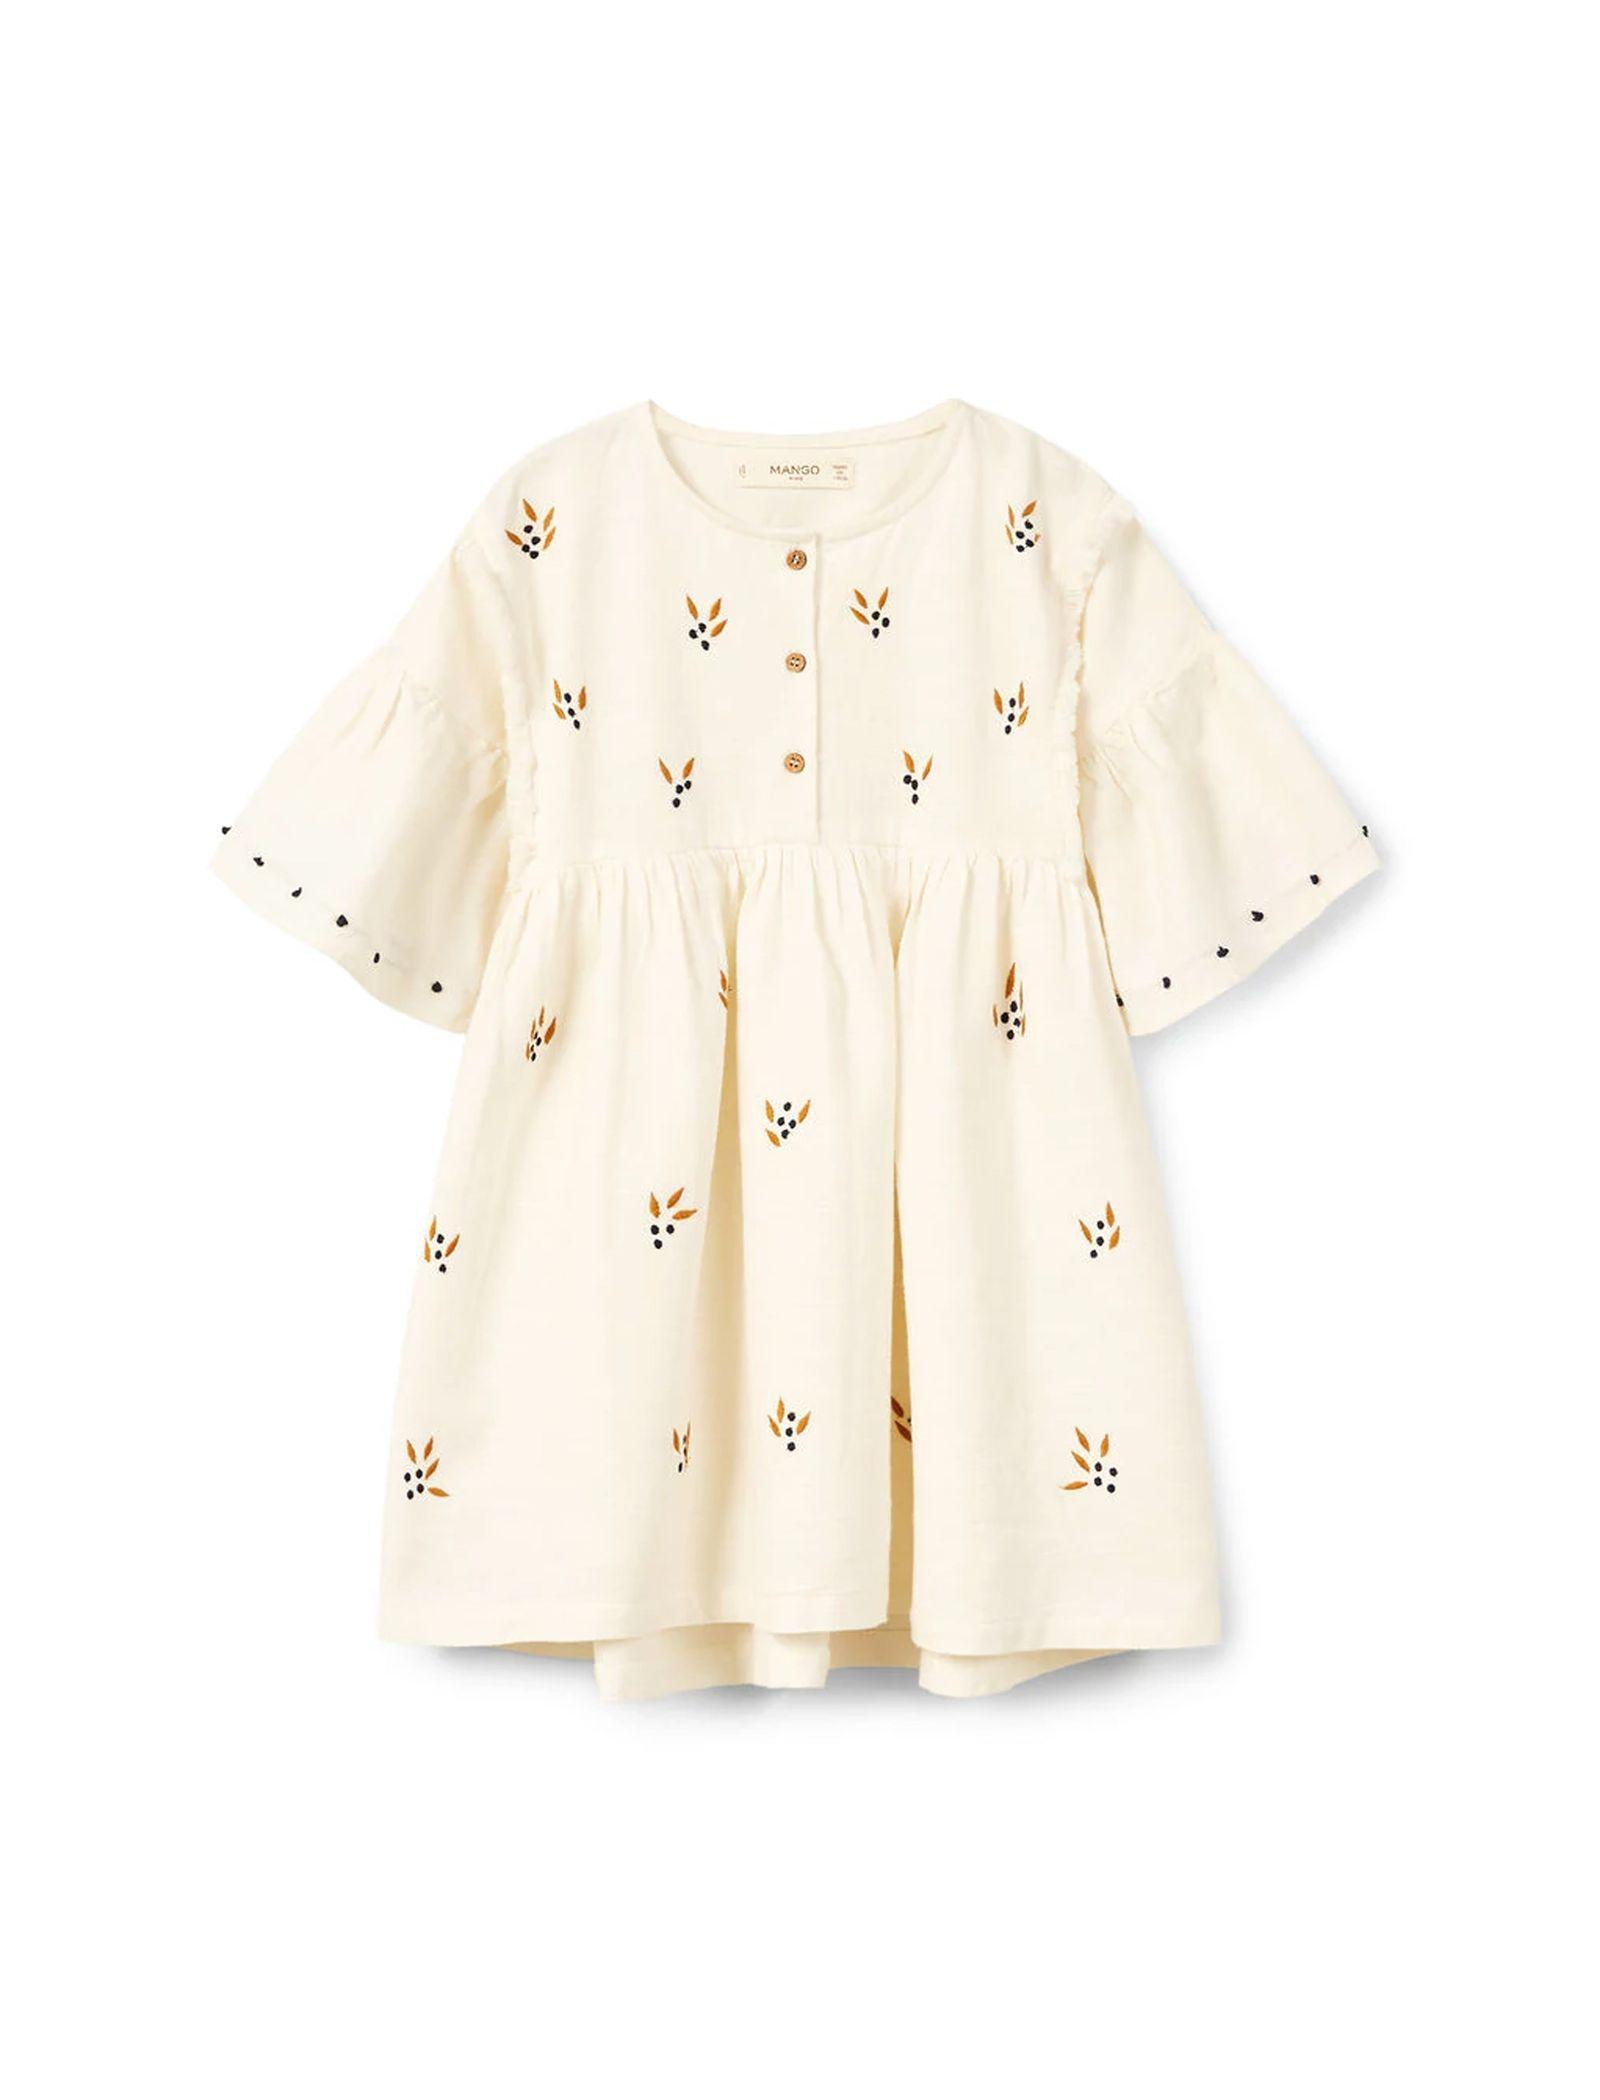 پیراهن نخی روزمره دخترانه - مانگو - سفيد - 1